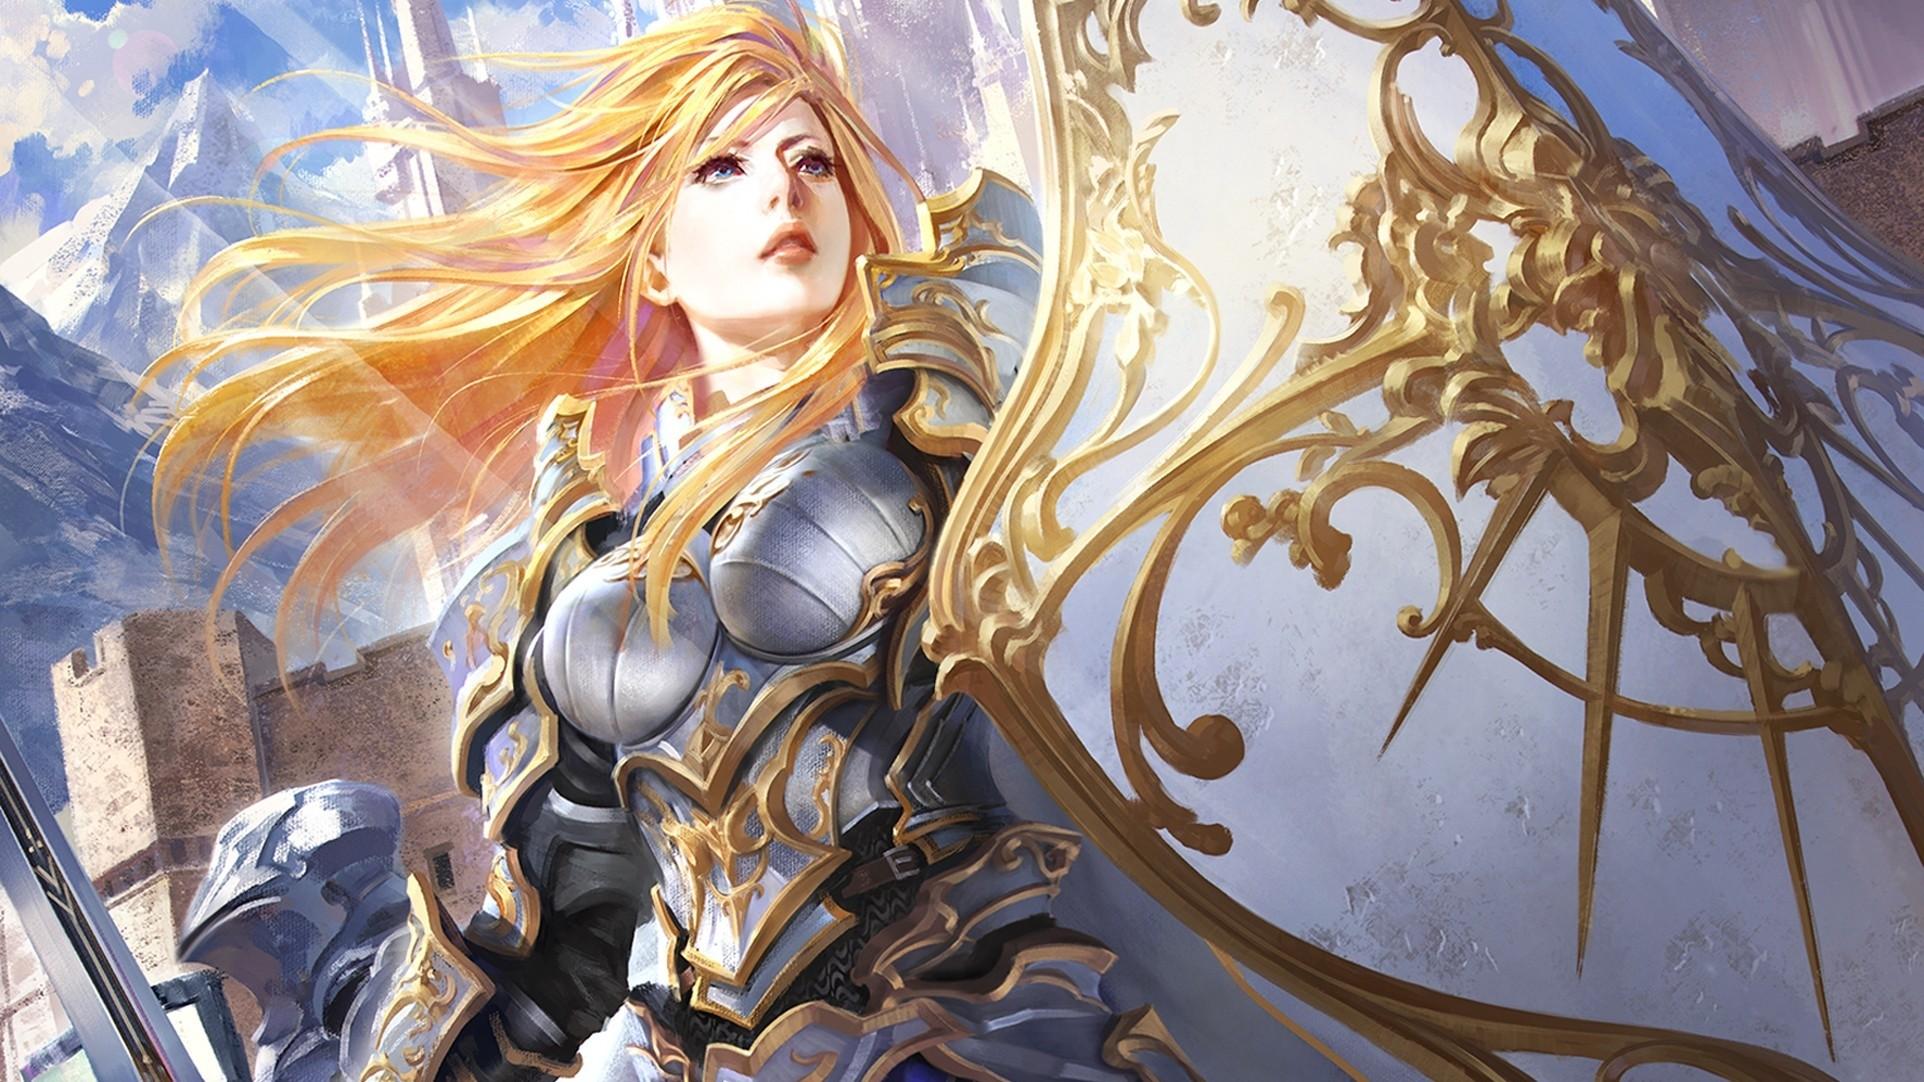 General 1924x1082 fantasy art blonde Armored long hair shield fantasy girl